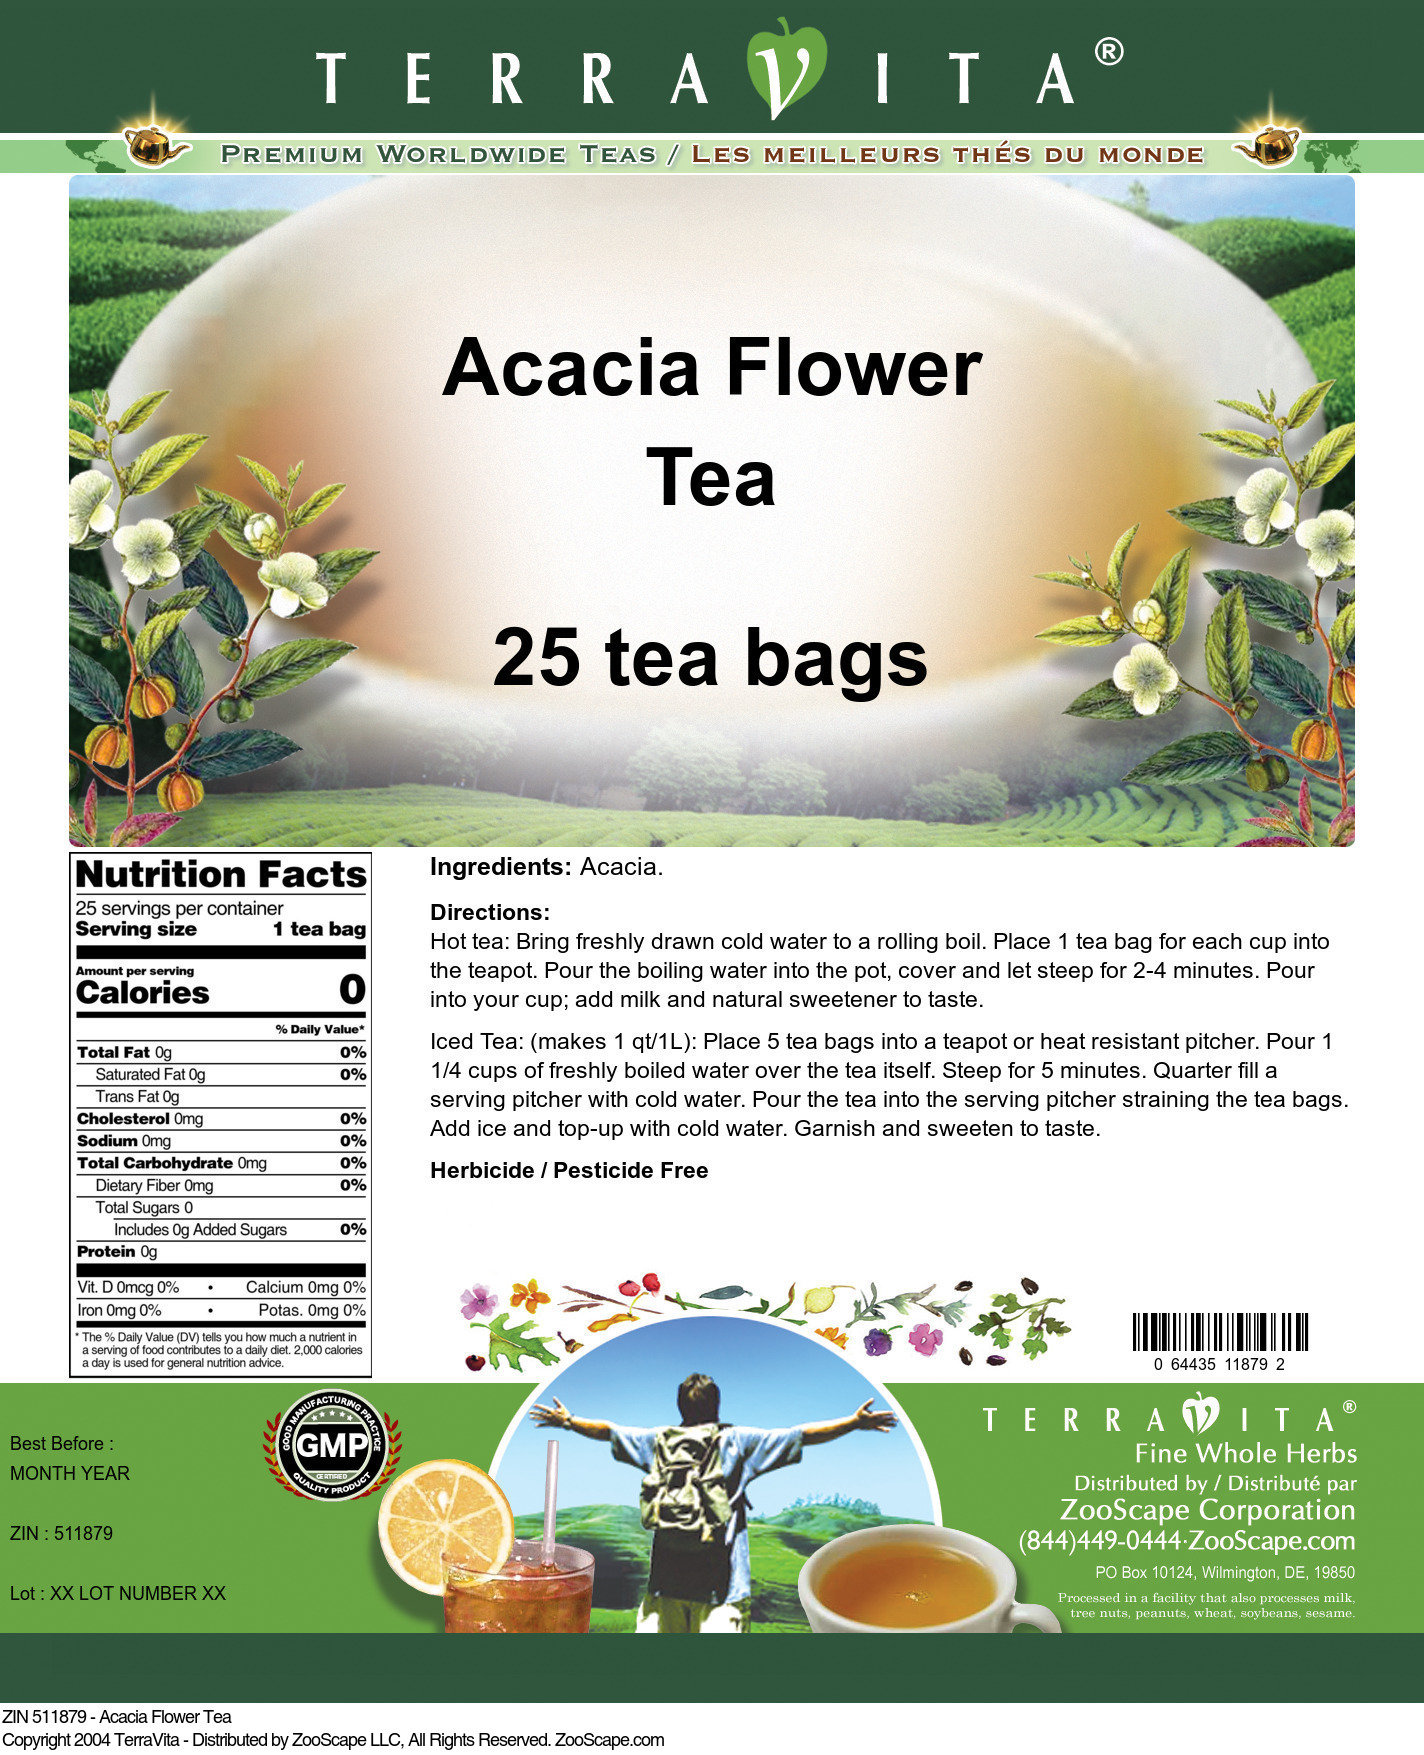 Acacia Flower Tea